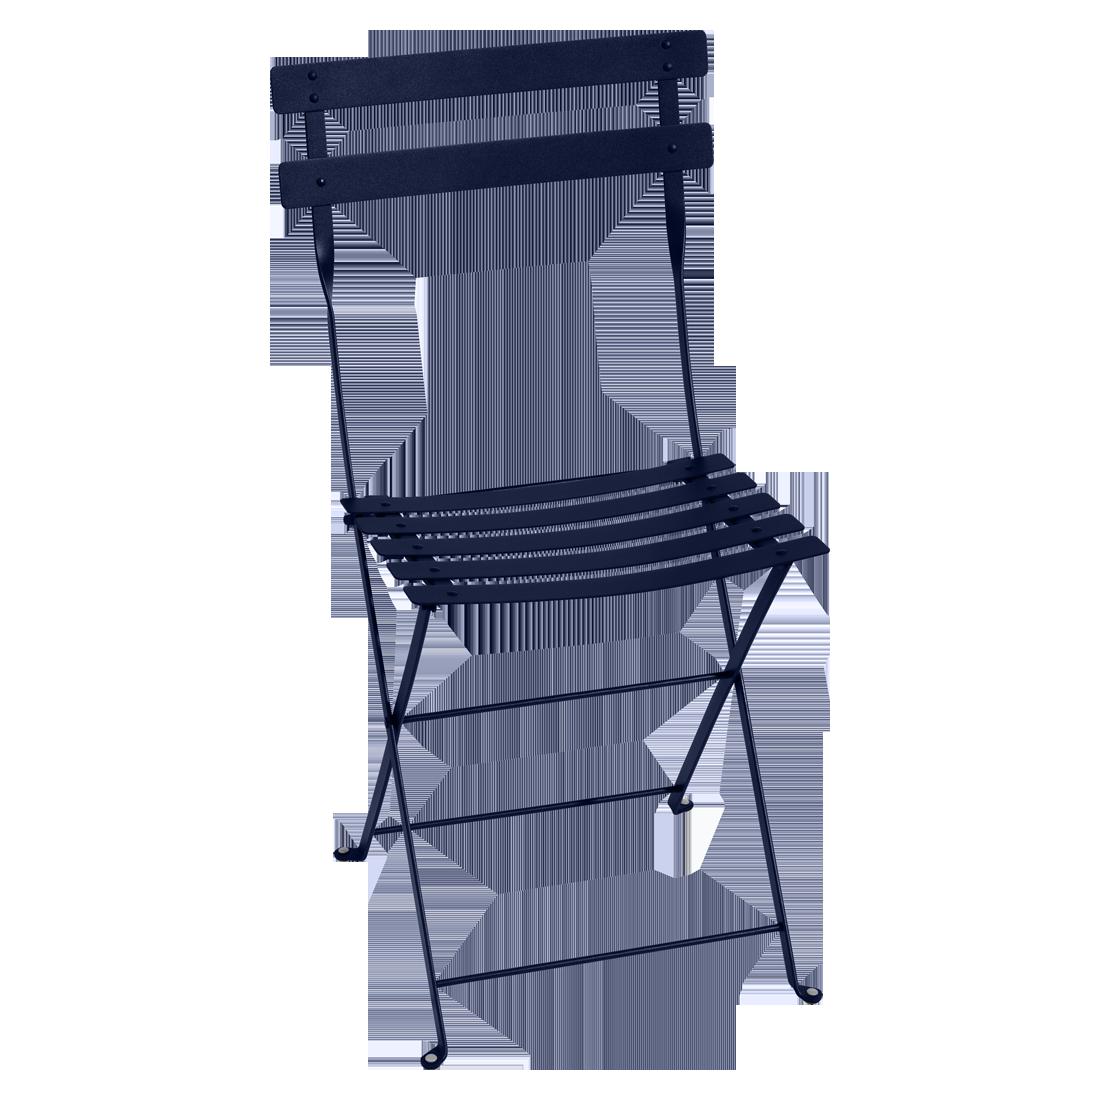 chaise bistro, chaise bistrot, chaise metal pliante, chaise fermob, chaise pliante, chaise de jardin, chaise pliante bleu